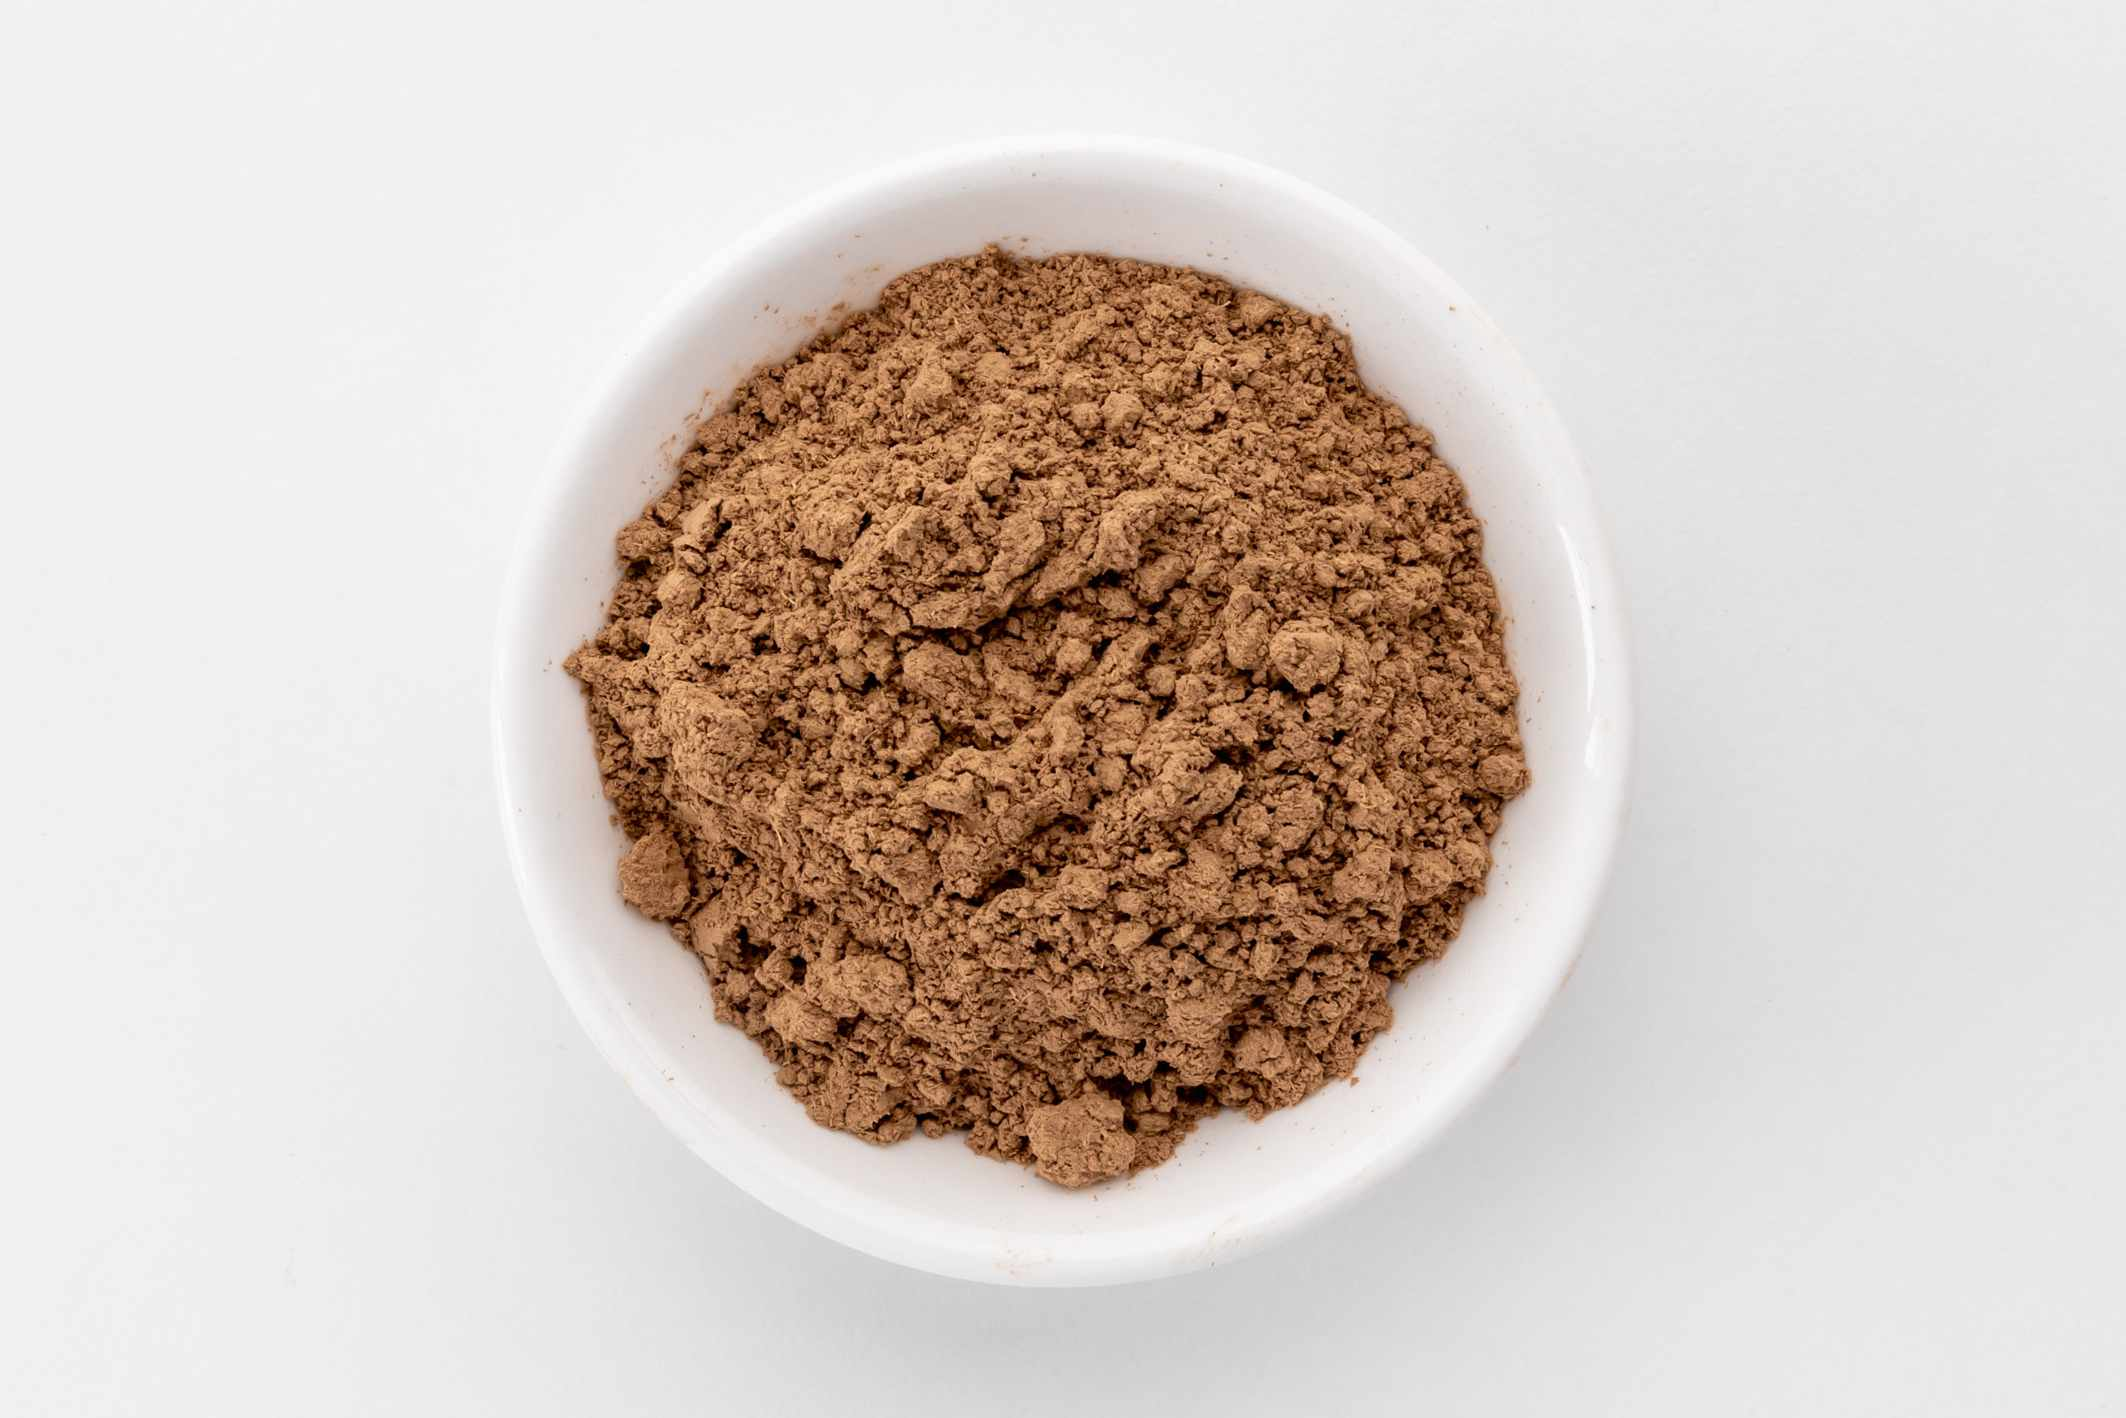 Butea Superba powder